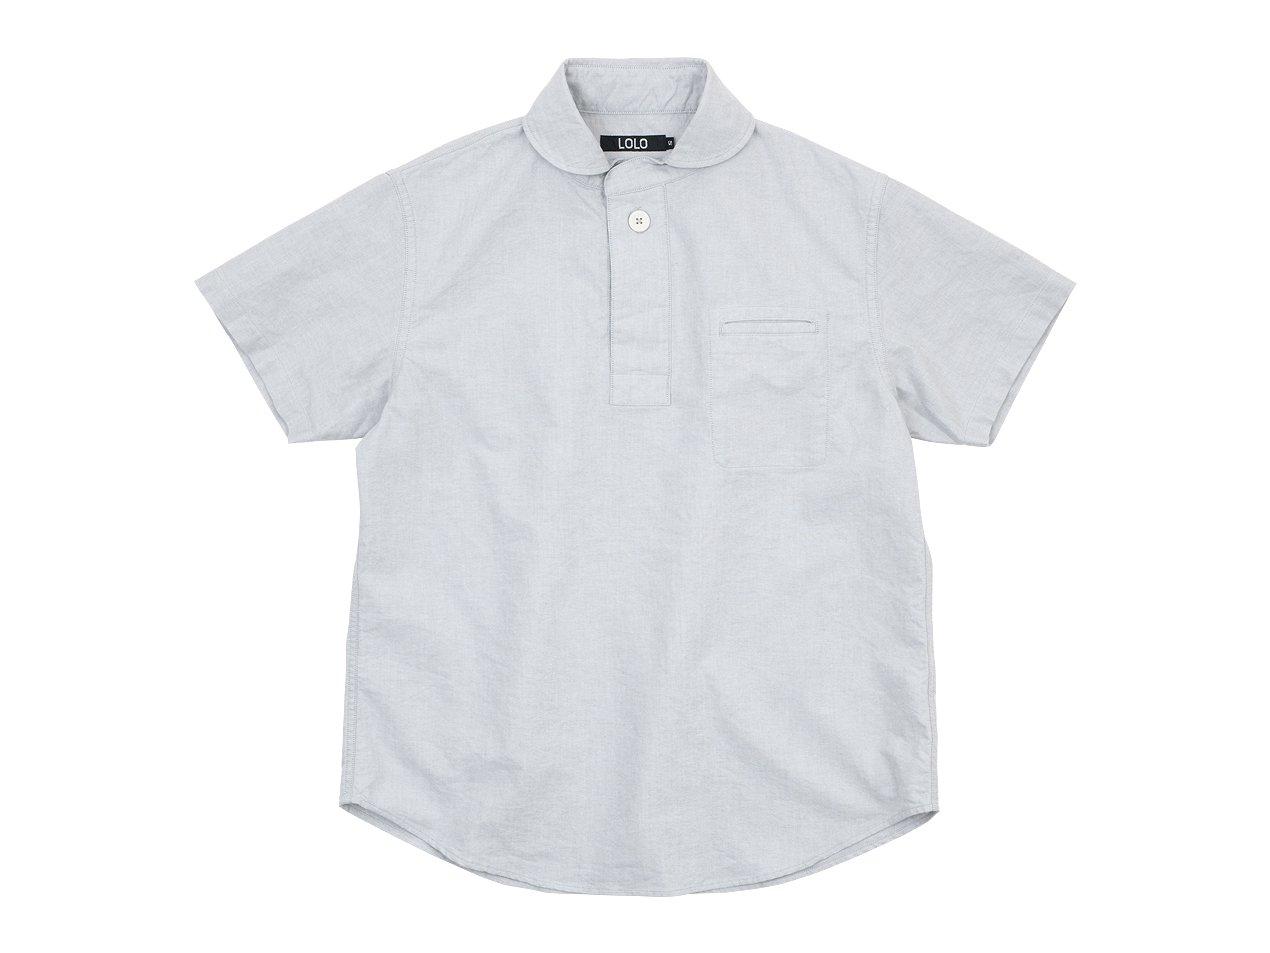 LOLO コットンプルオーバーシャツ 半袖 LIGHT GRAY